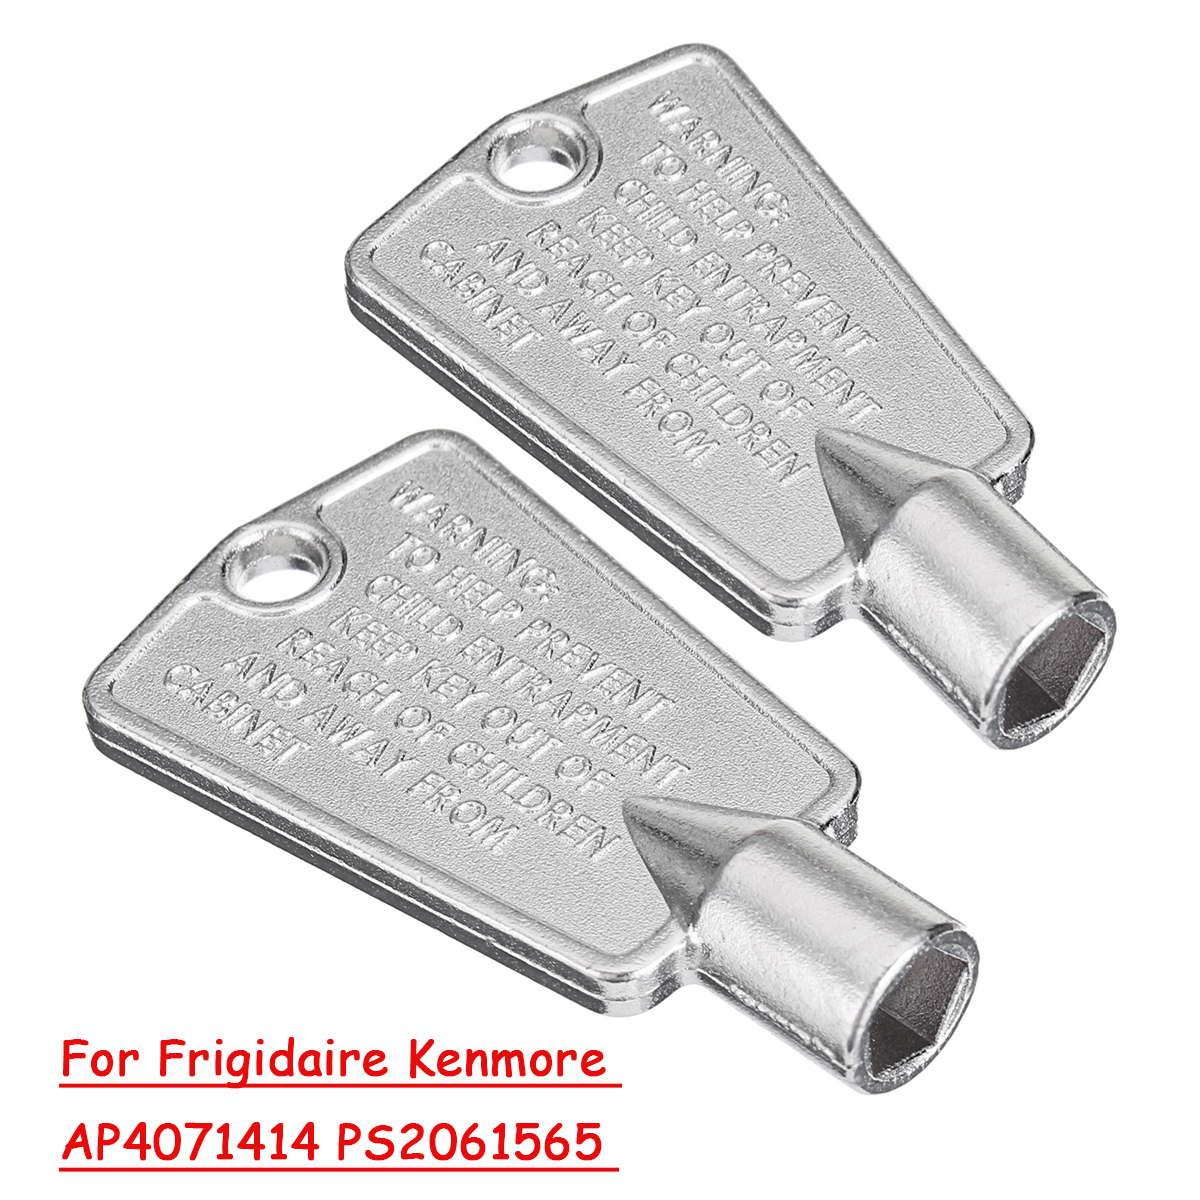 Freezer Door Key For Amana//Maytag//KitchenAid//Norge Refrigeration Equipment